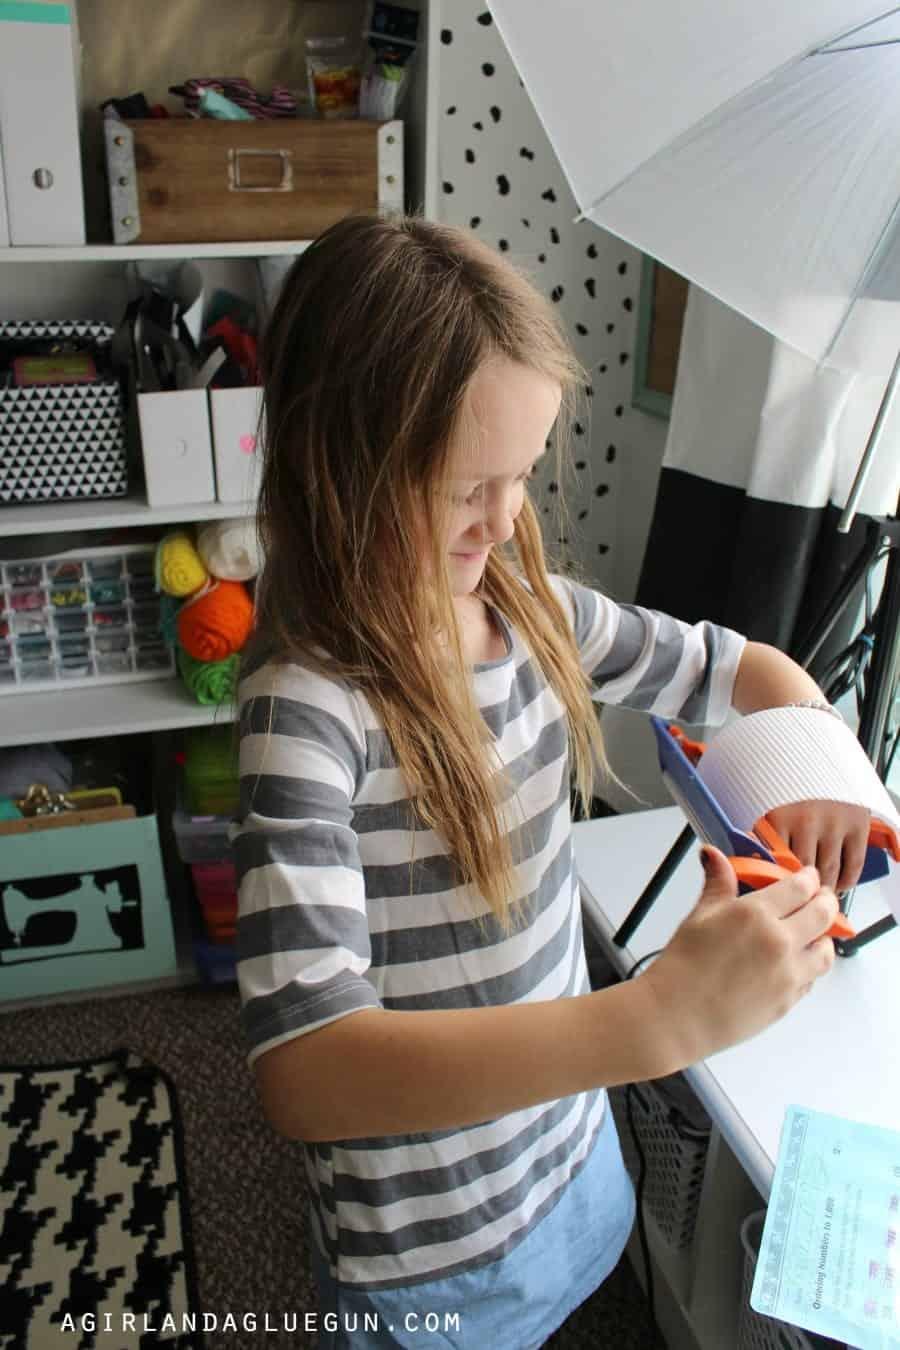 kid crafting